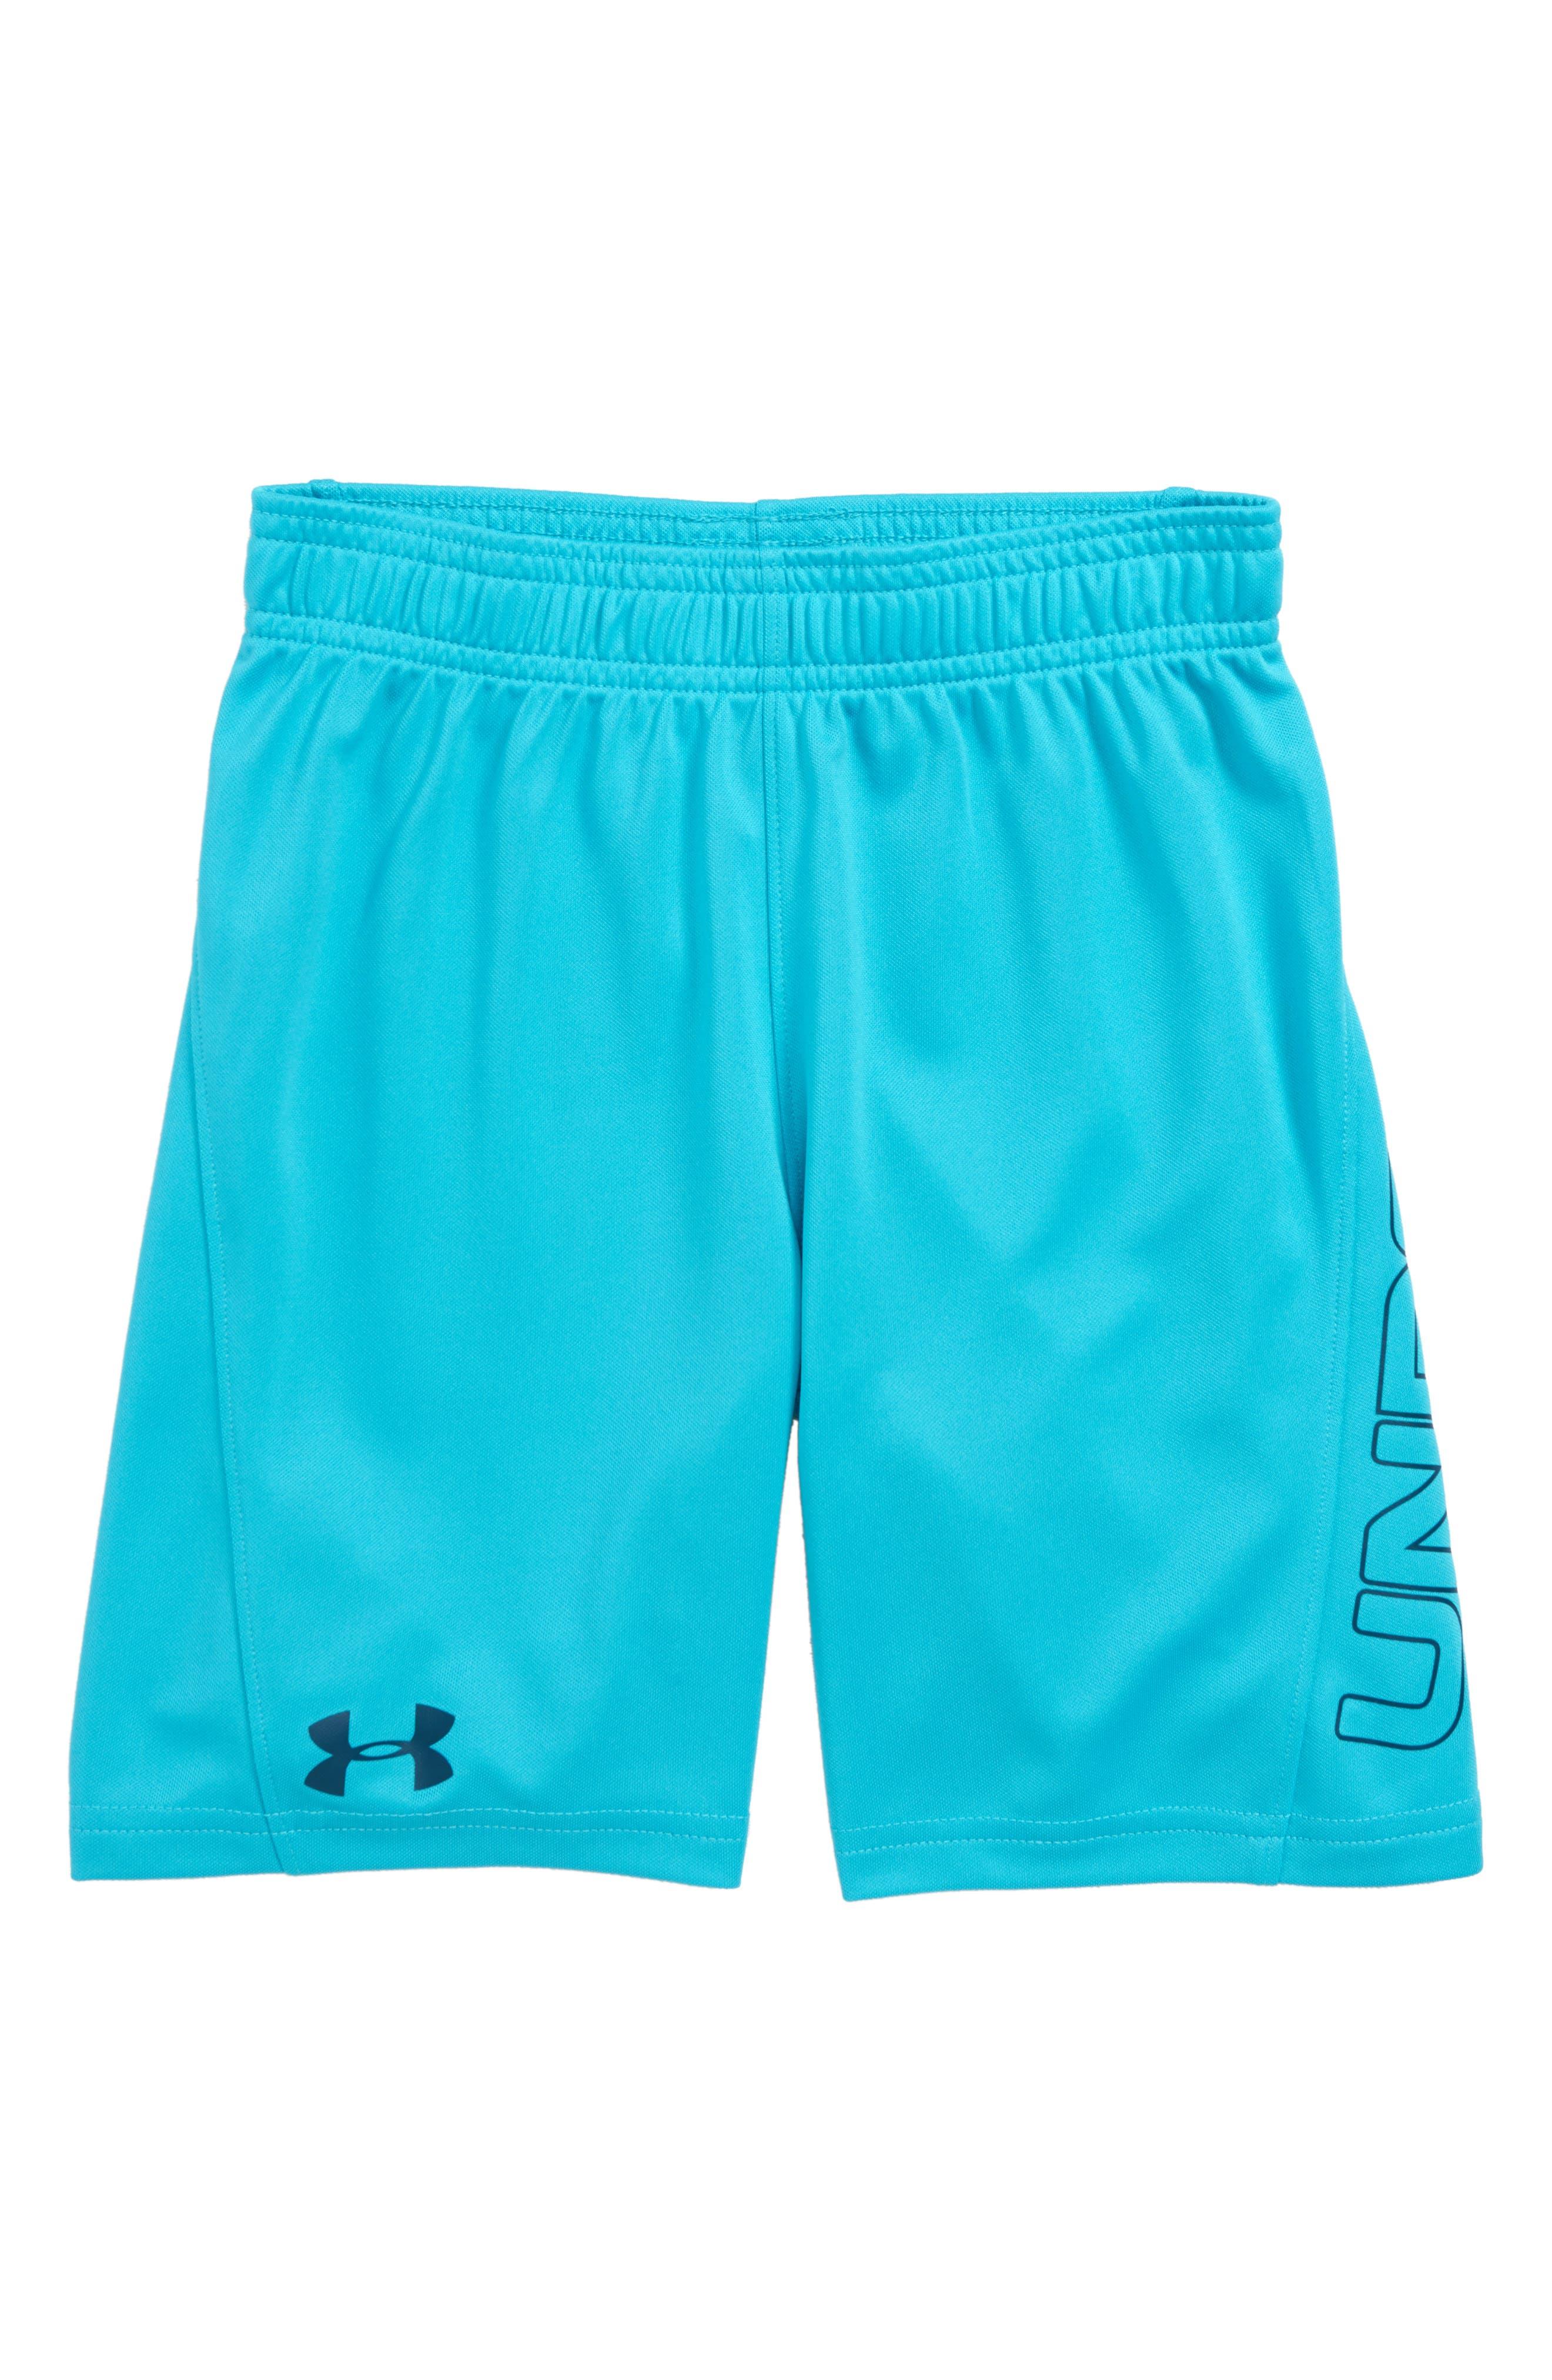 Solid Kickoff Shorts,                         Main,                         color, DECEIT